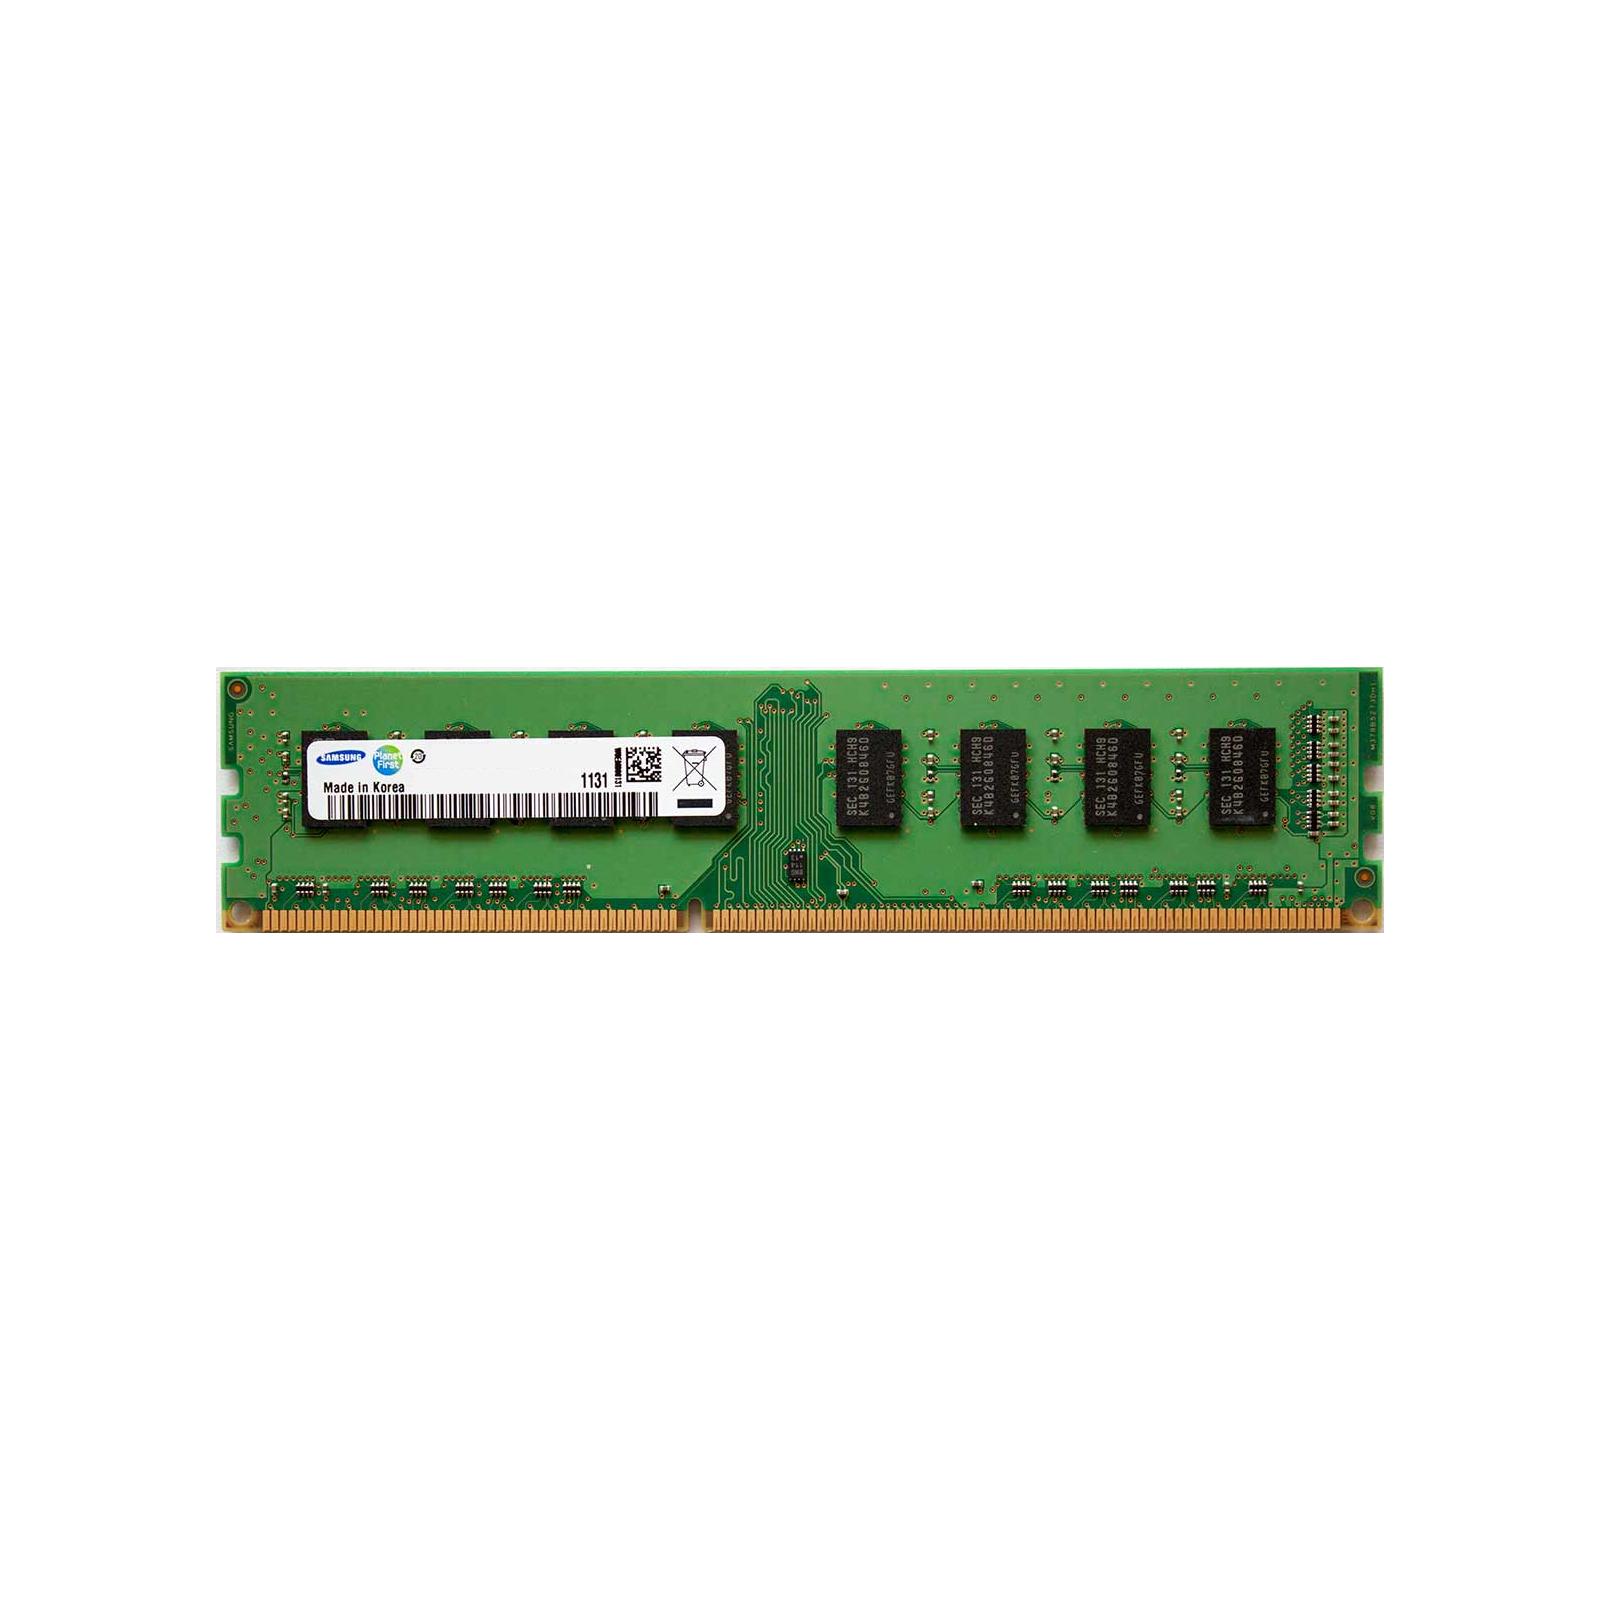 Модуль памяти для компьютера DDR3 2GB 1333 MHz Samsung (K4B2G0846С)